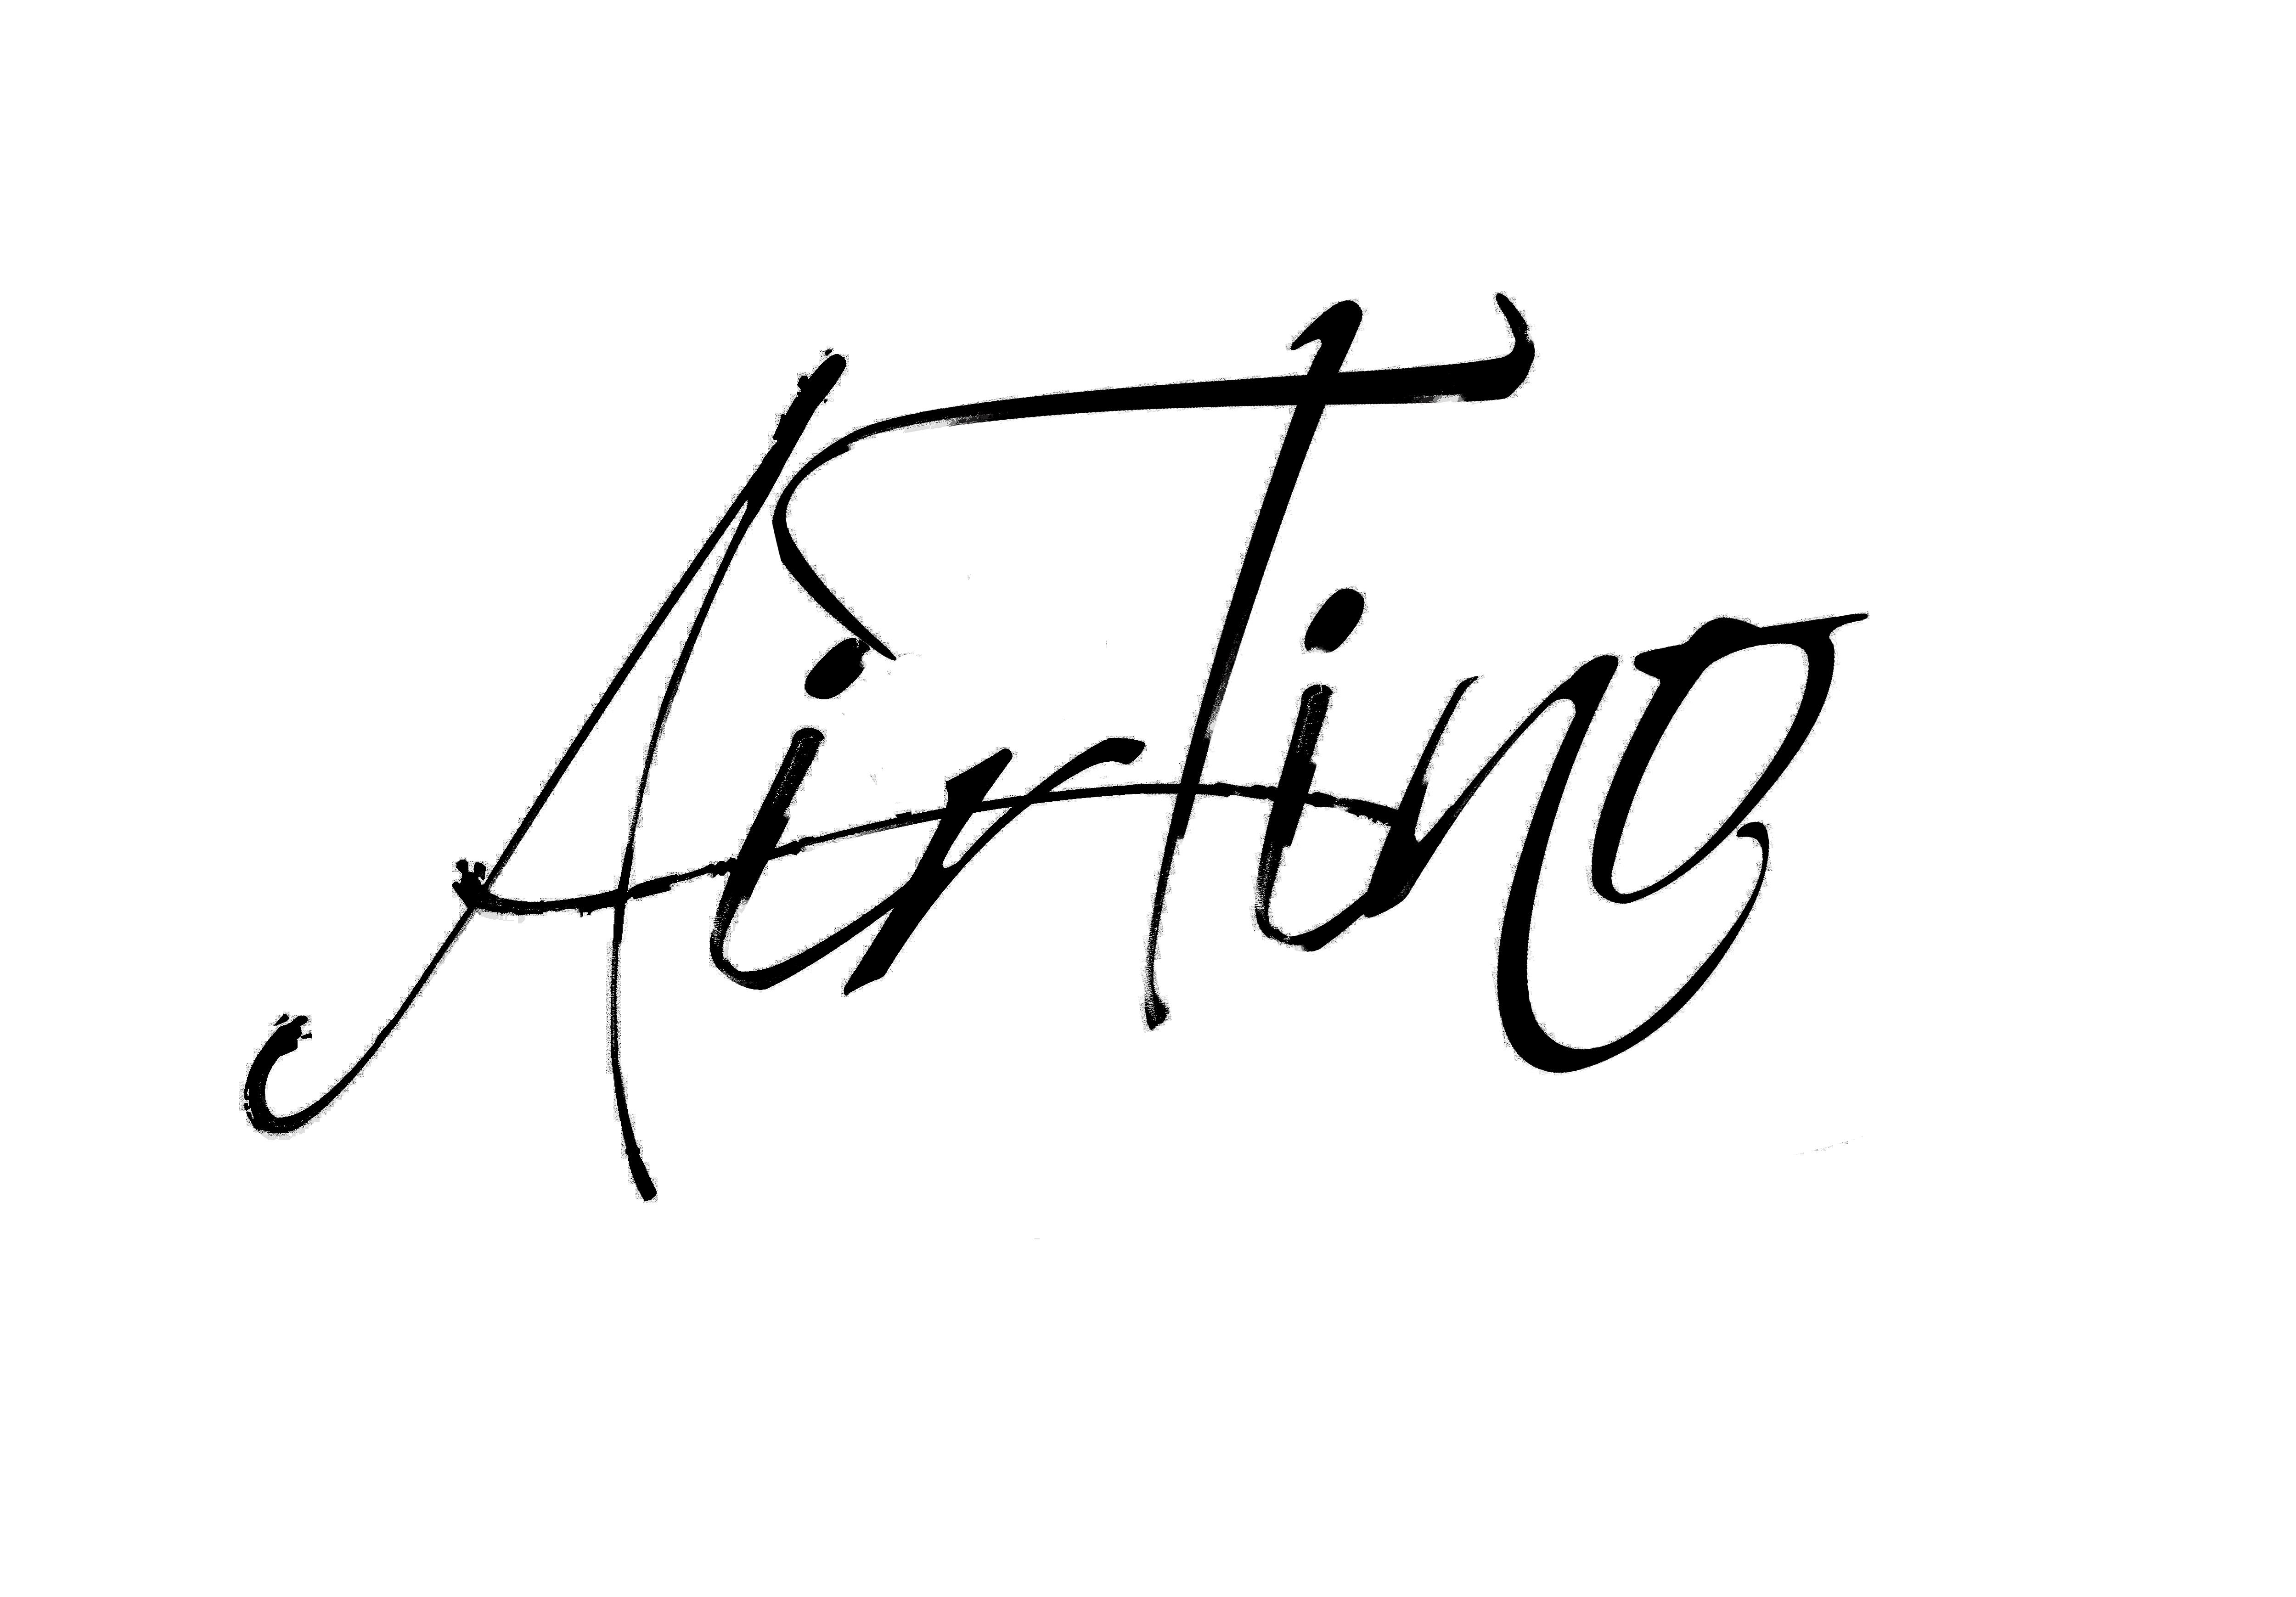 Martin Arrey  Aiyuk's Signature